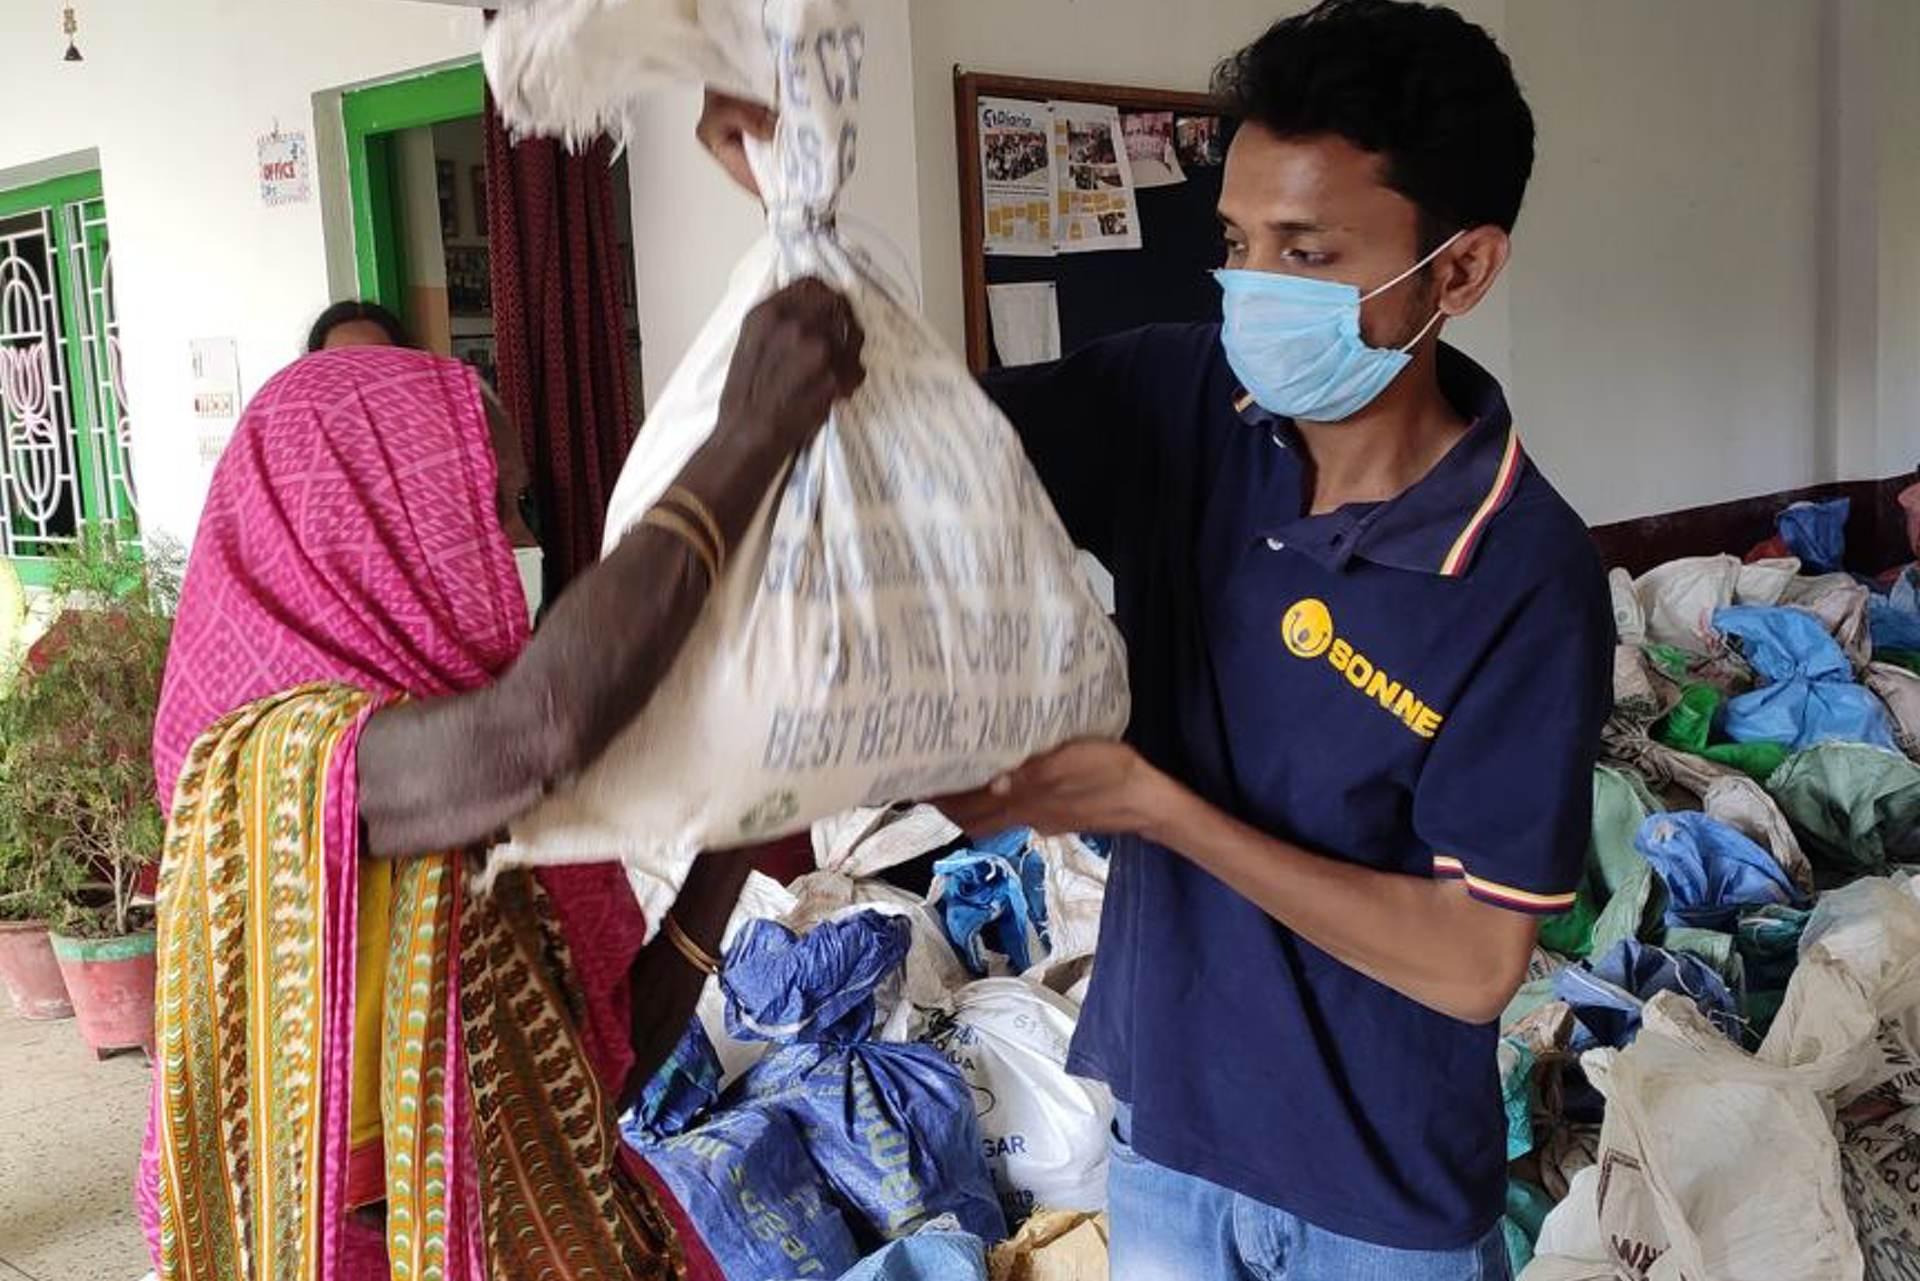 Corona Katastrophe in Indien - SONNE-International hilft